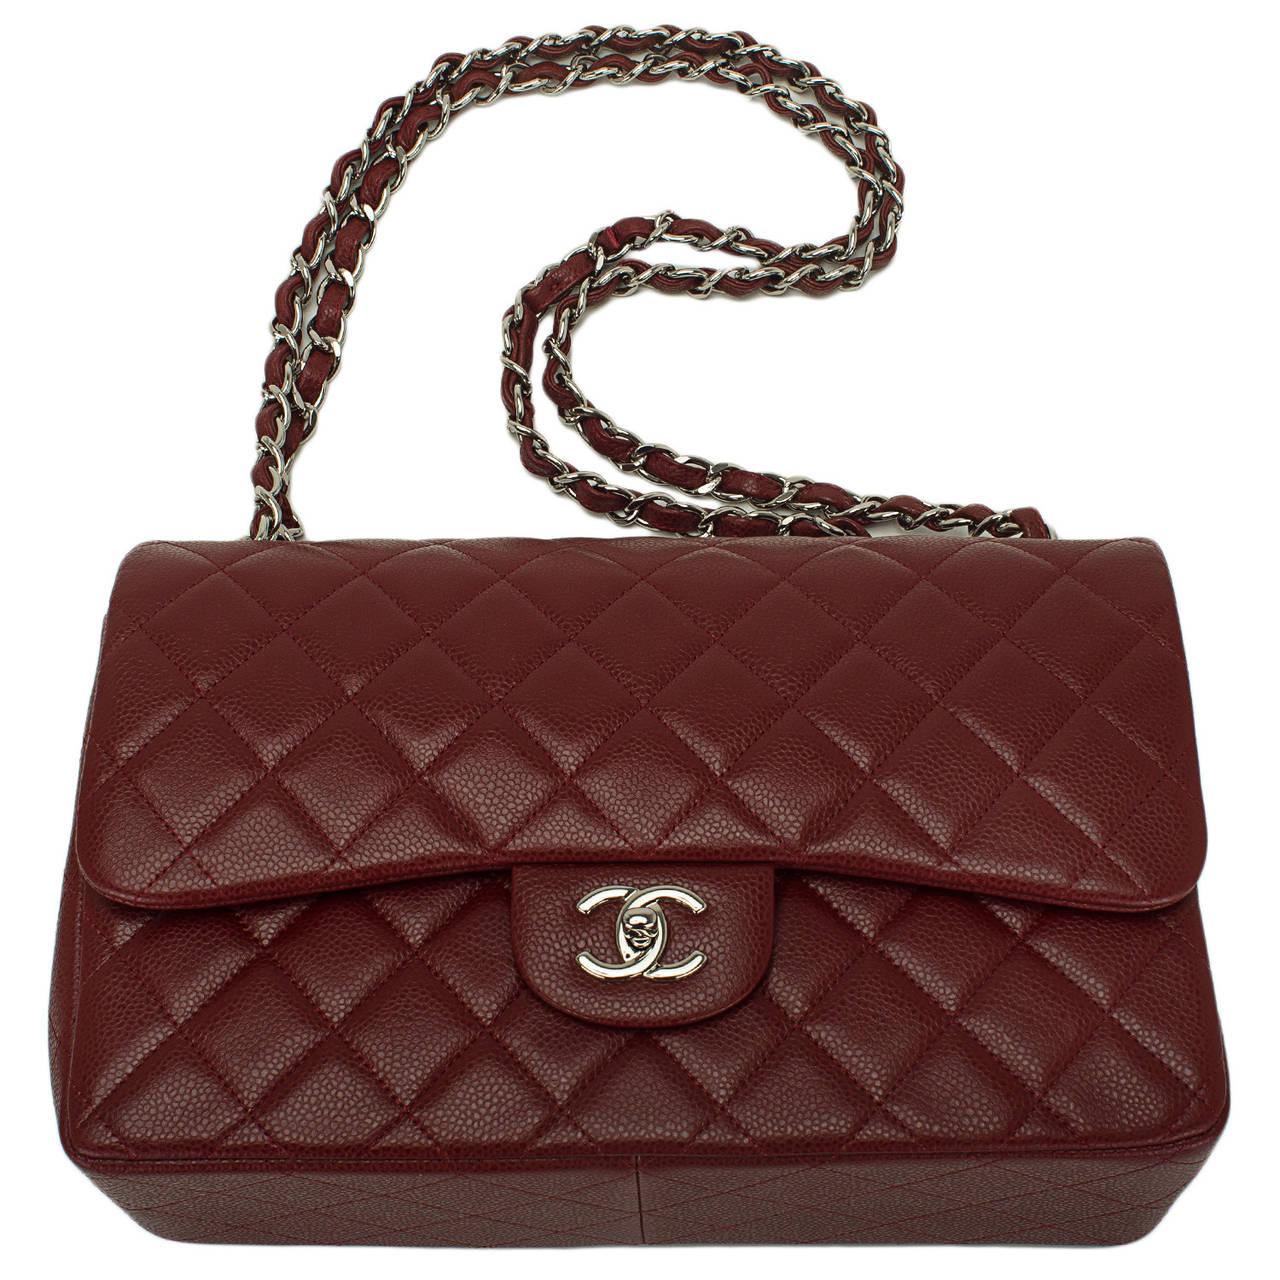 5f272d8b9dc9 Chanel Classic Jumbo Double Flap Bag For Sale | MIT Hillel